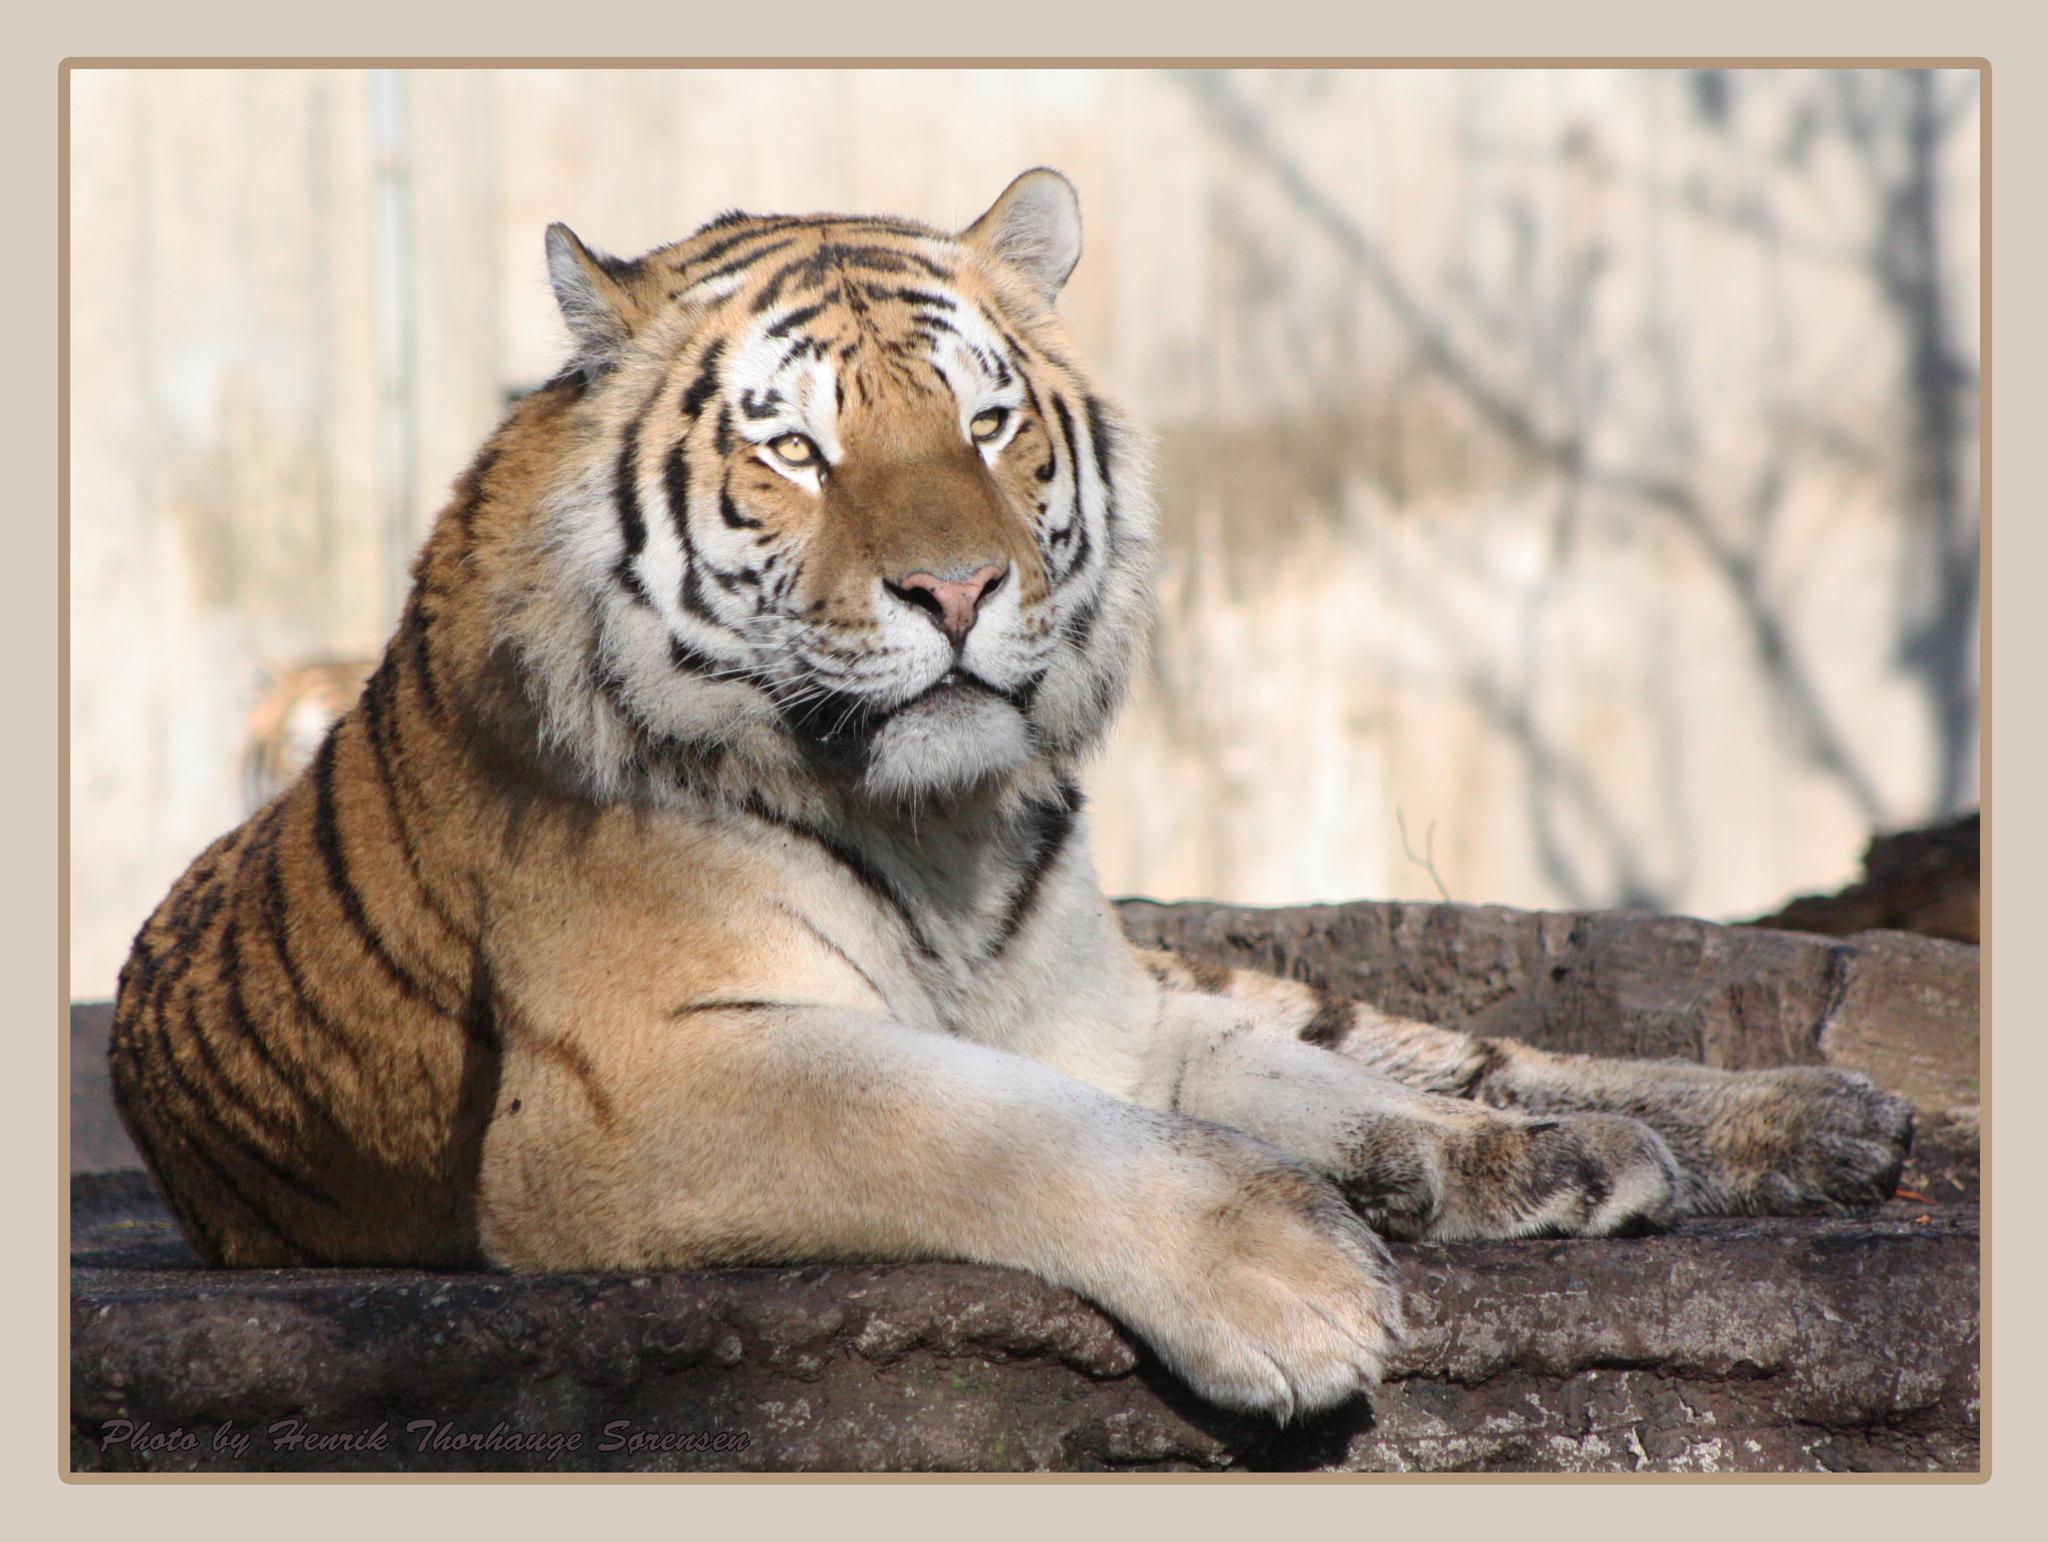 Amur Tiger by Henrik T. Sørensen